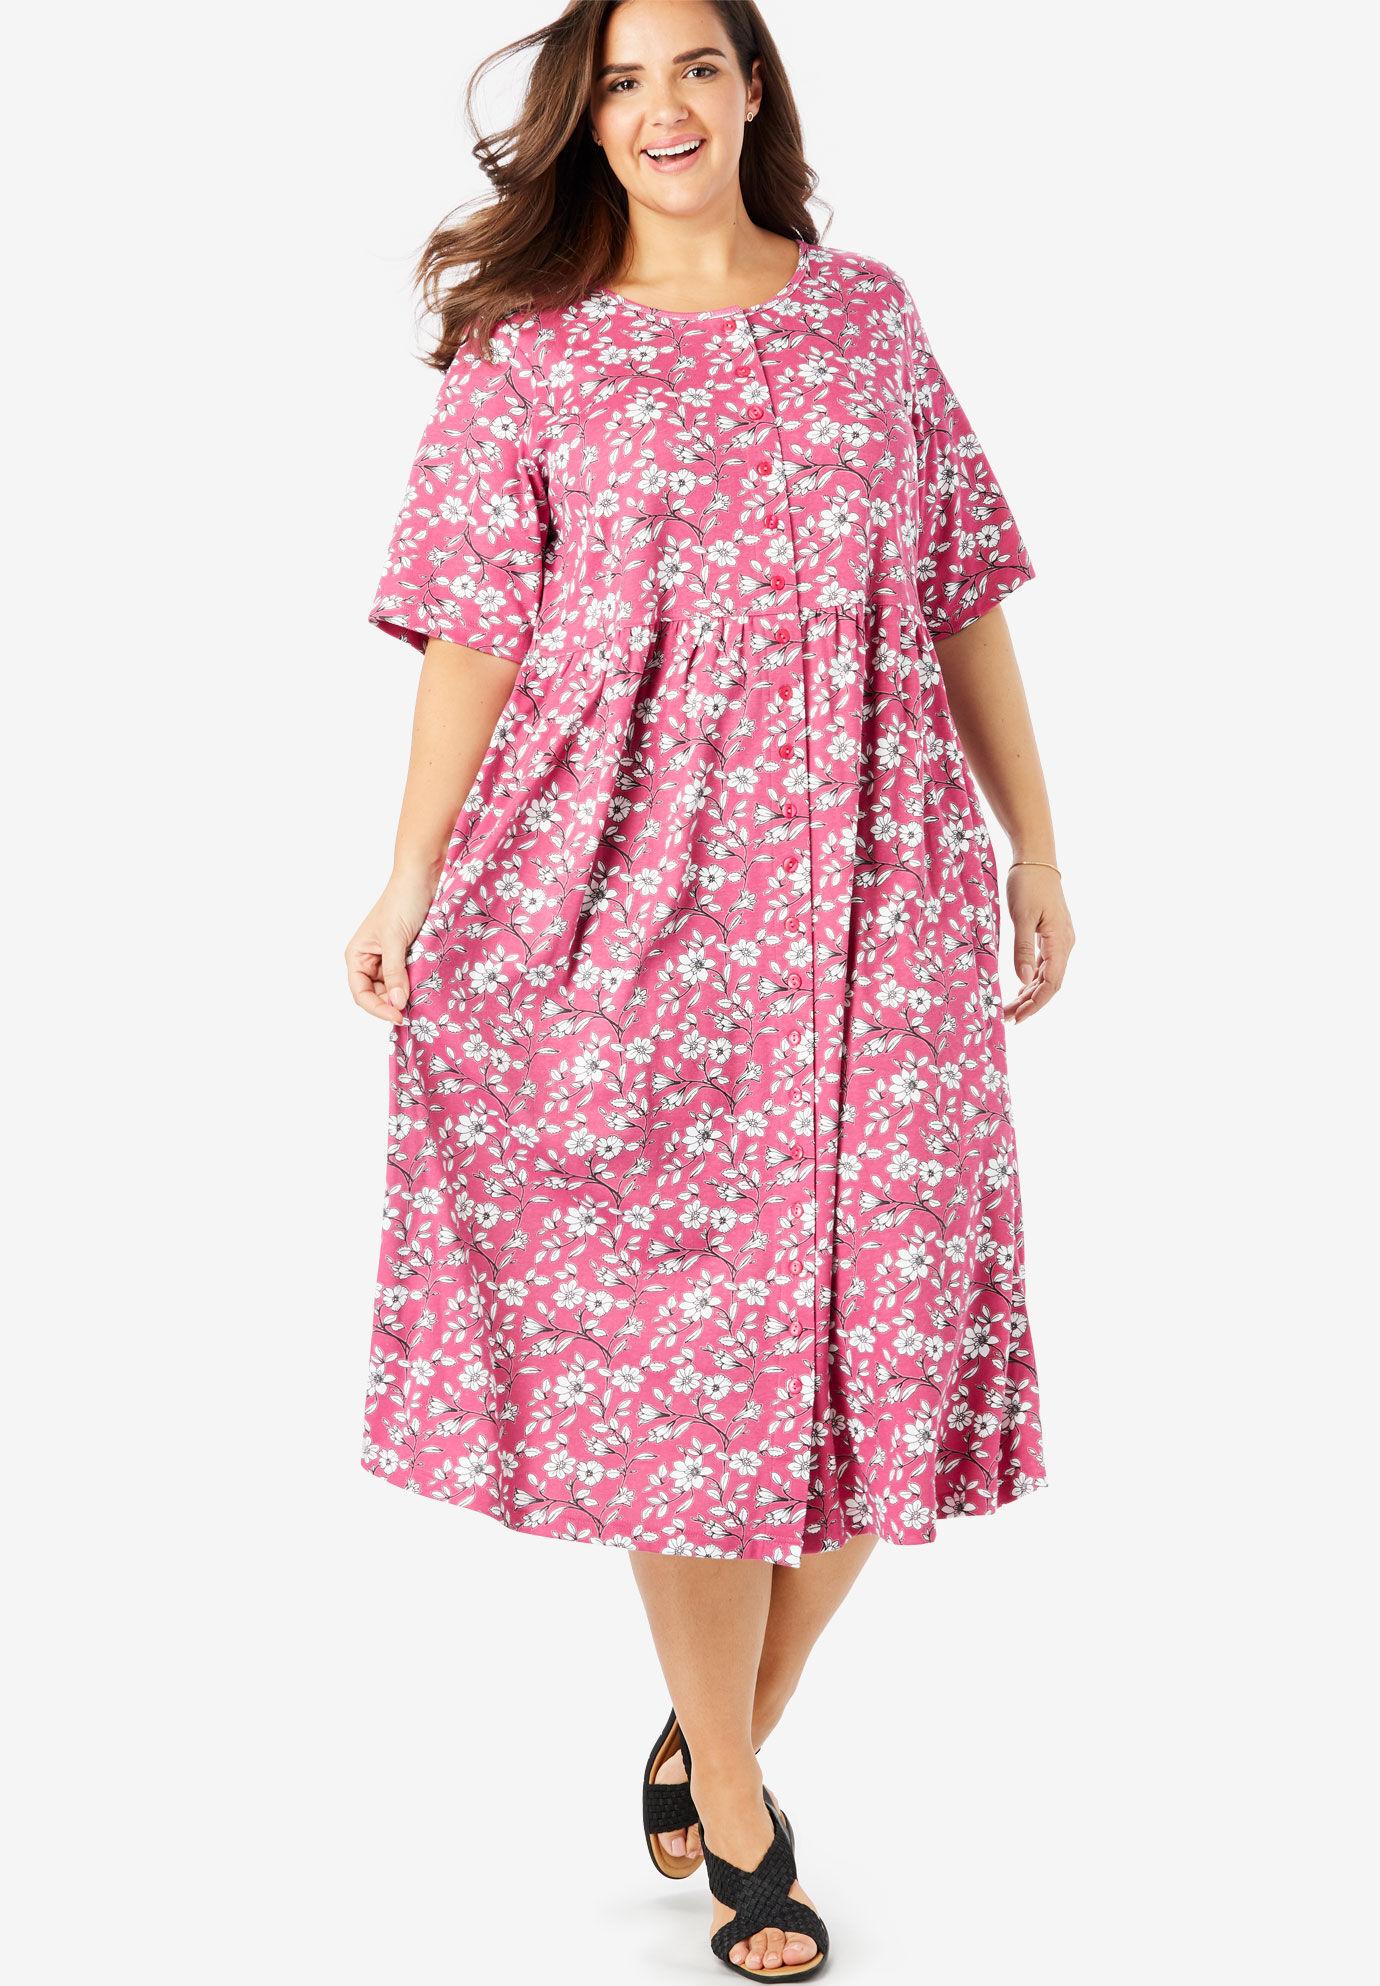 3X Plus Size Maxi Dresses